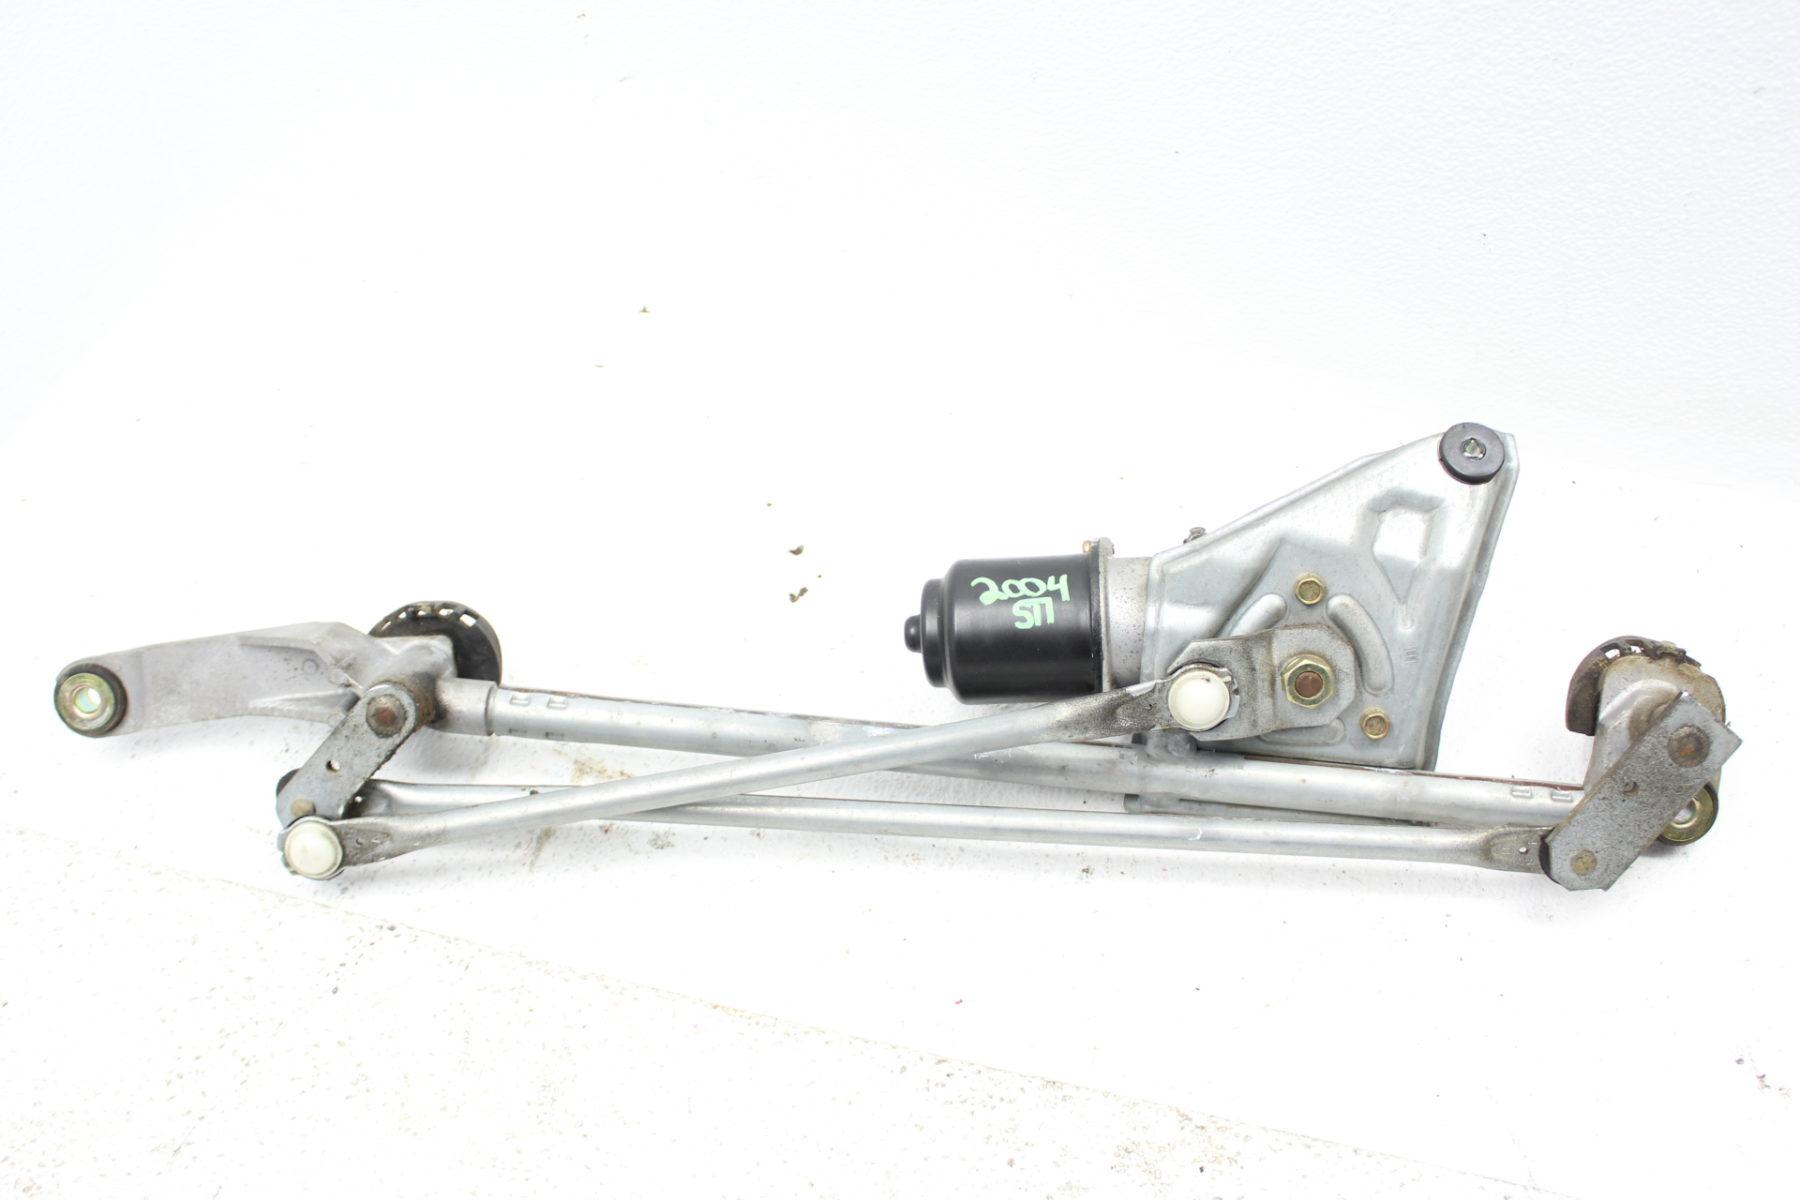 2004-2007 SUBARU WRX STI WINDSHIELD WIPER MOTOR LINKAGE